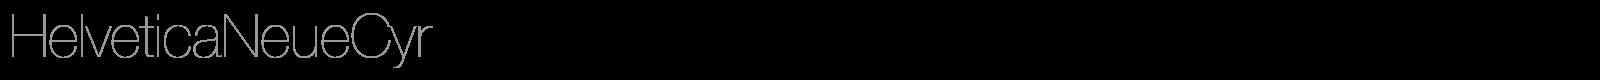 Download Free Font HelveticaNeueCyr